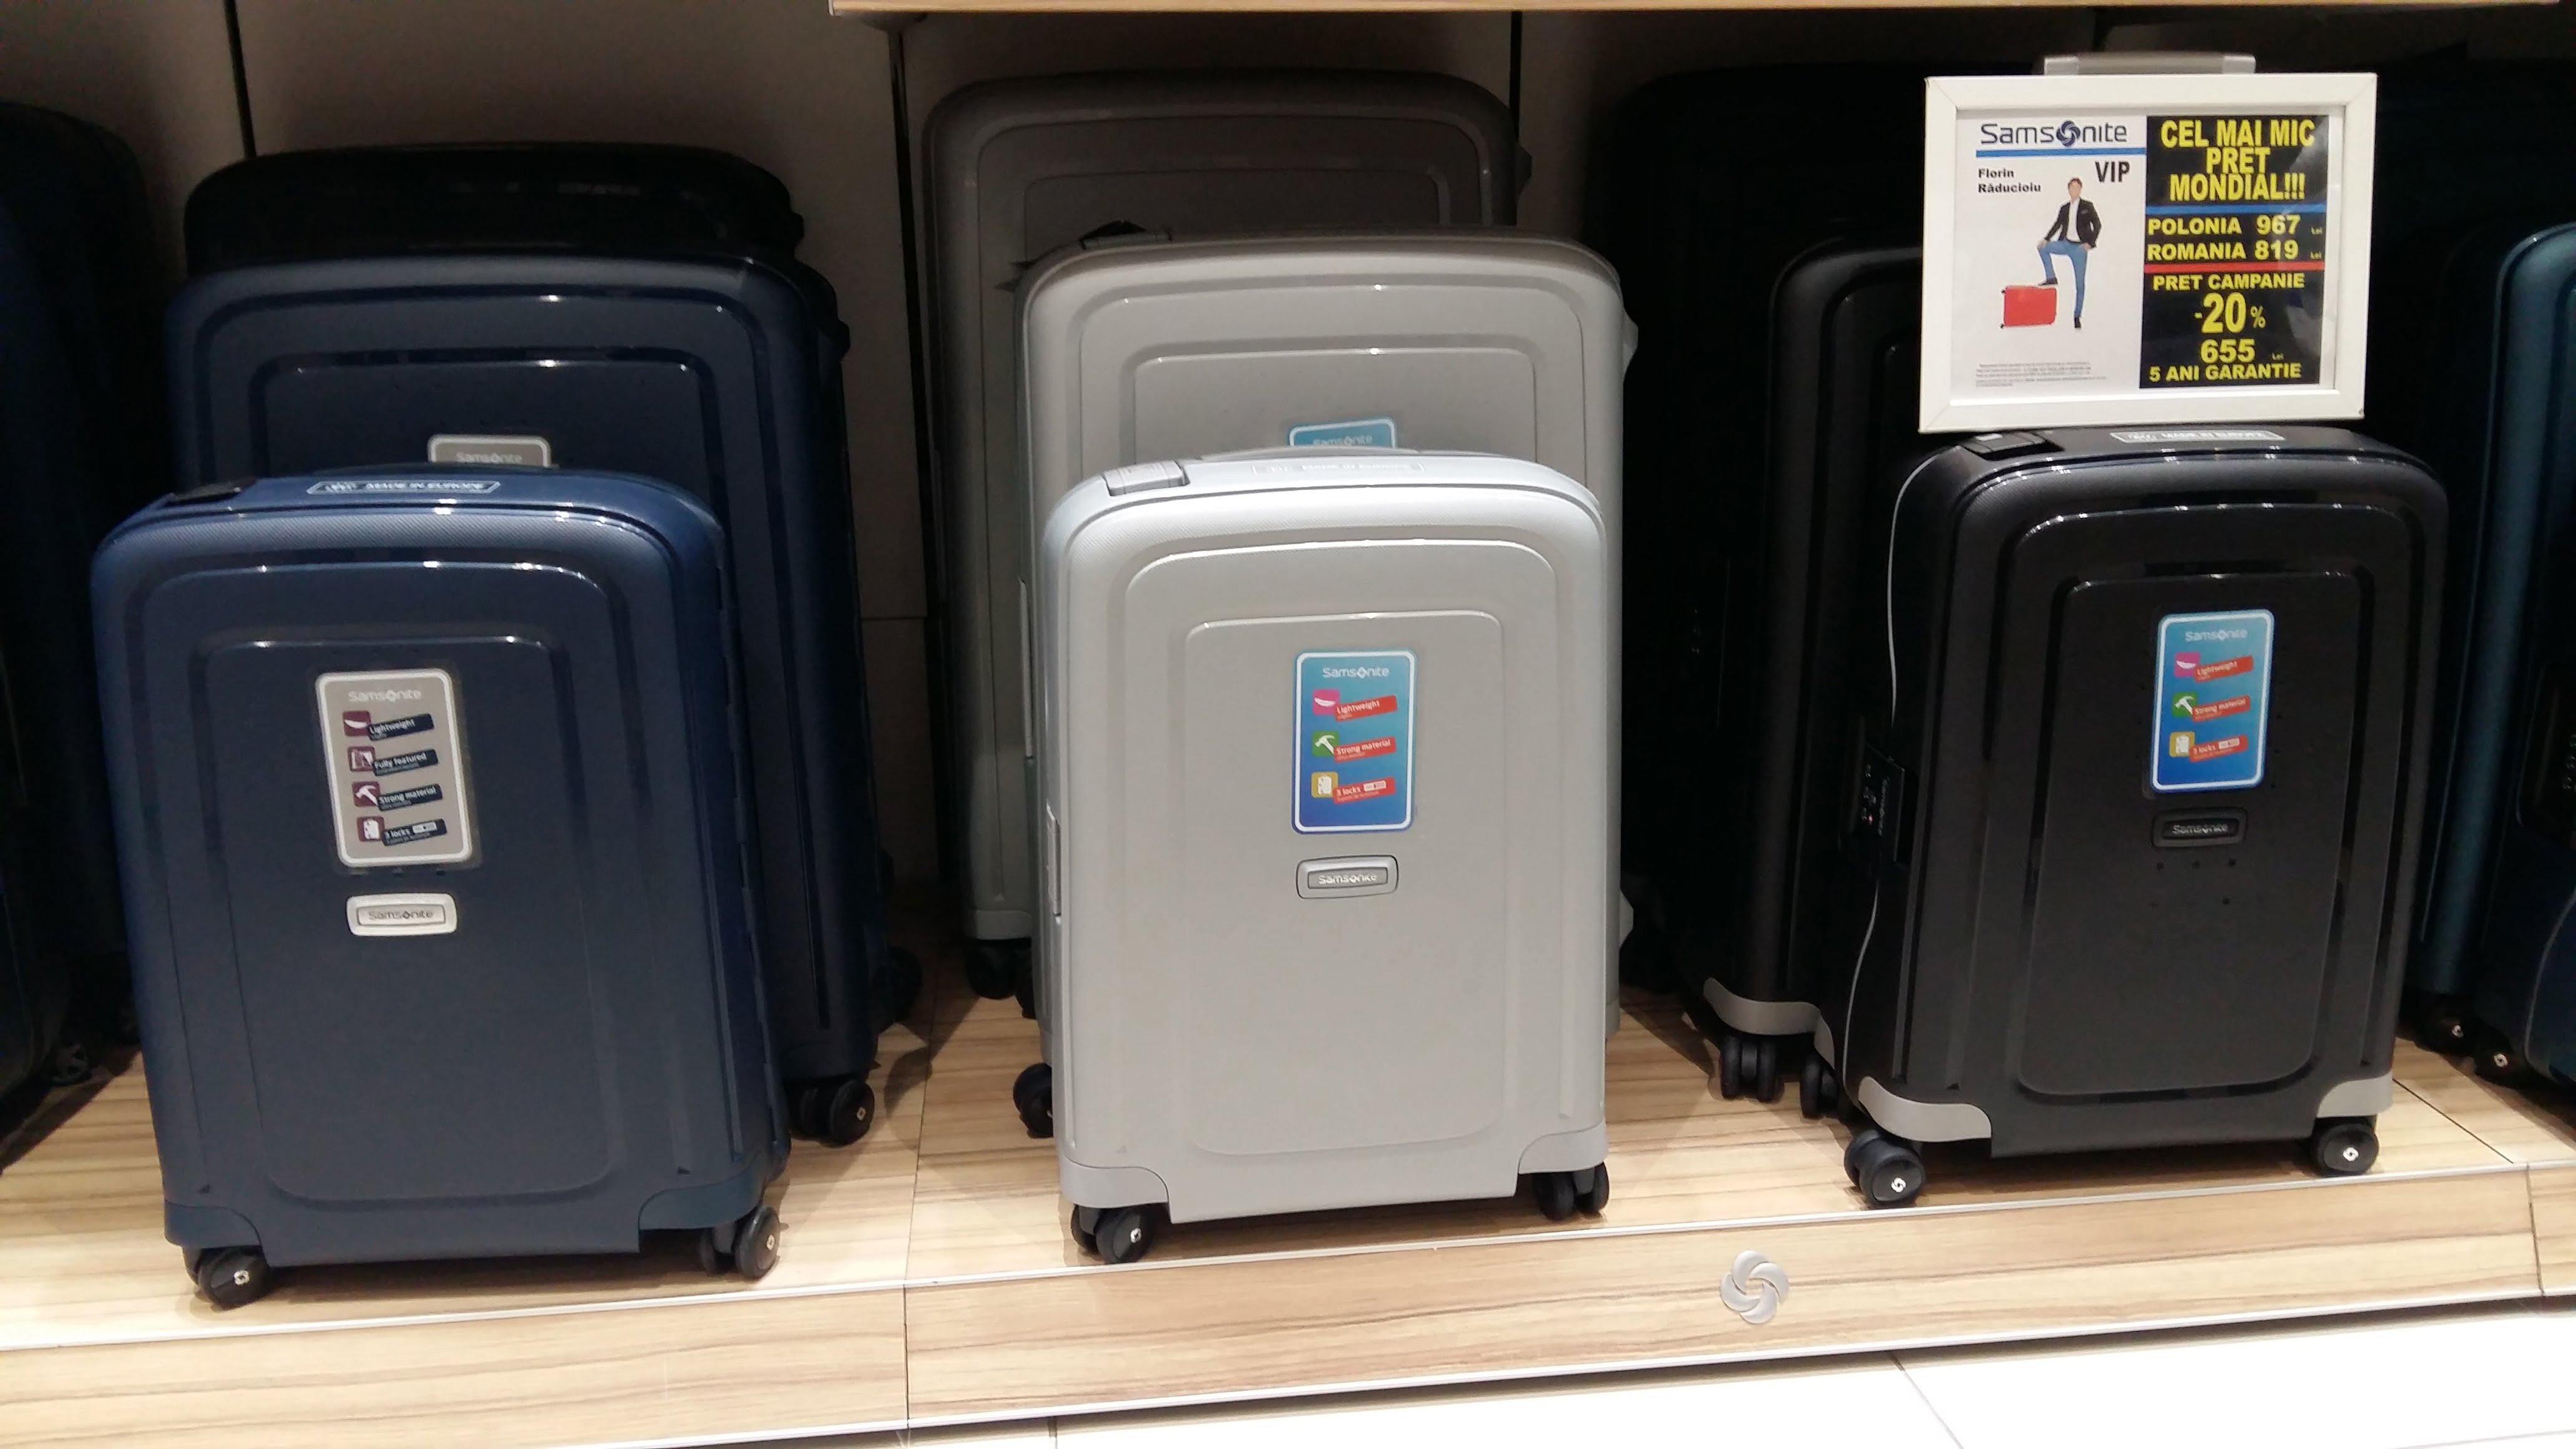 samsonite valize